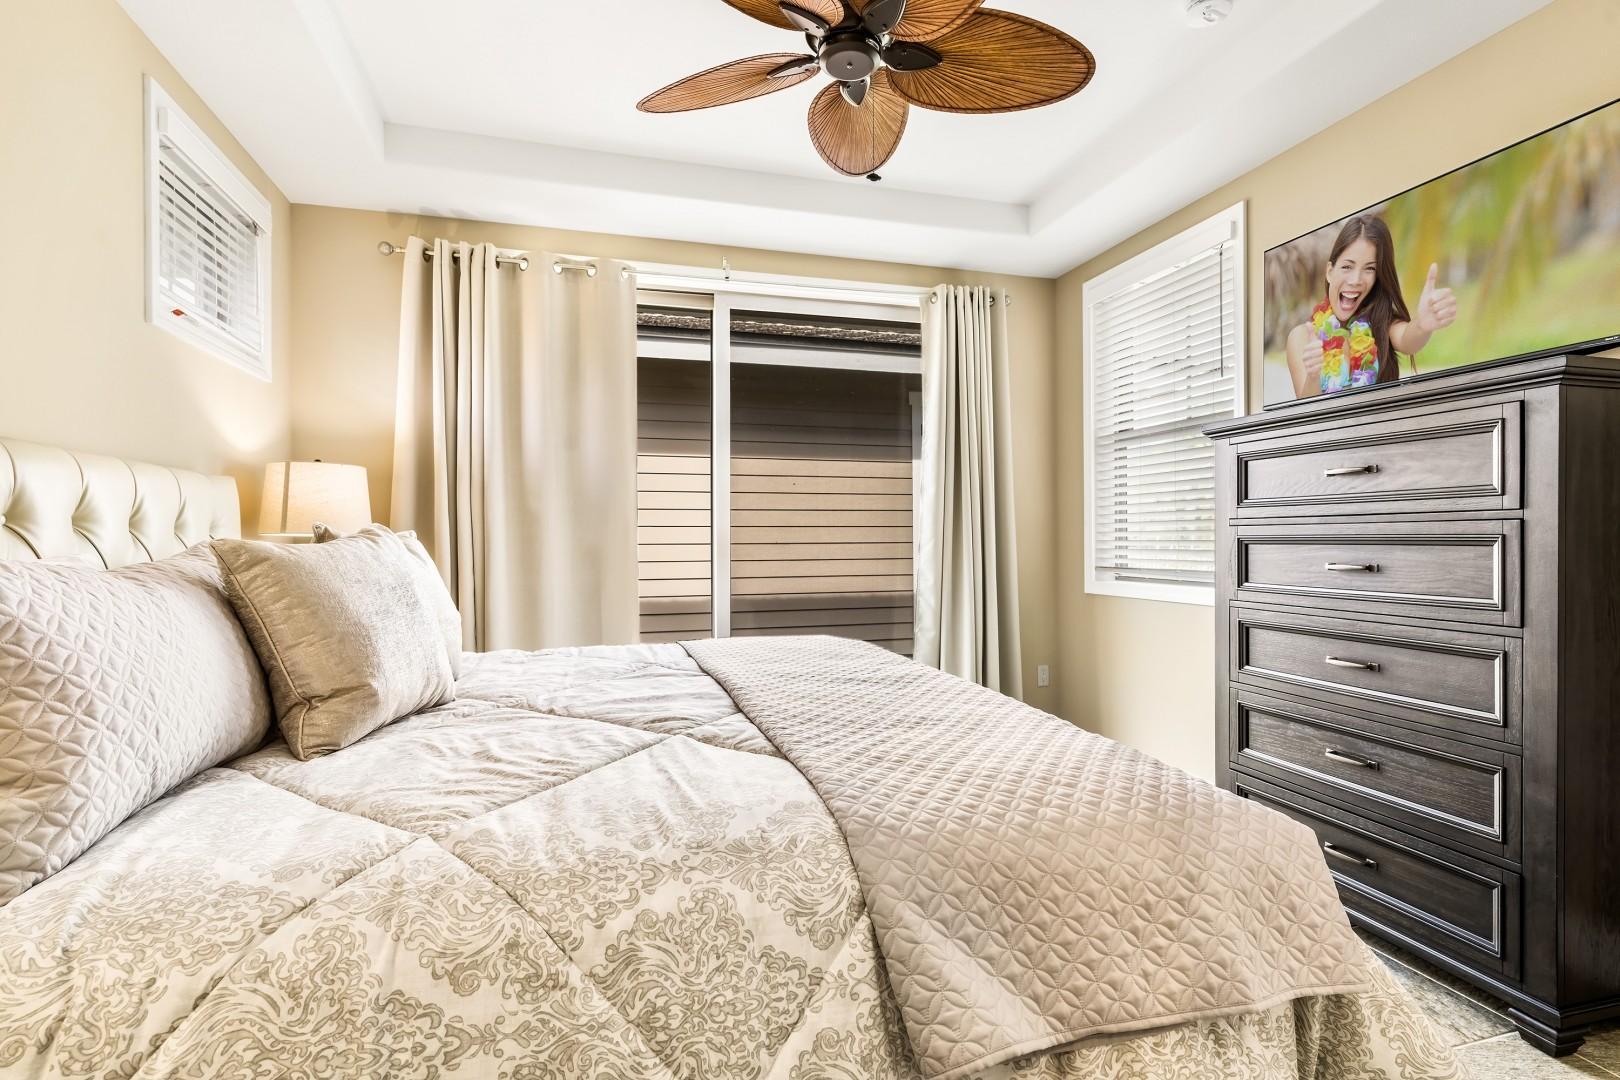 King bed, A/C, TV and Lanai access